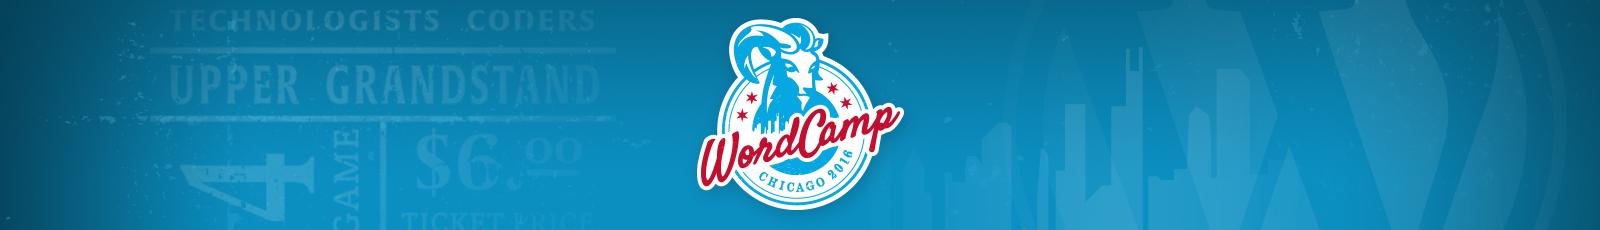 WordCamp Chicago 2016